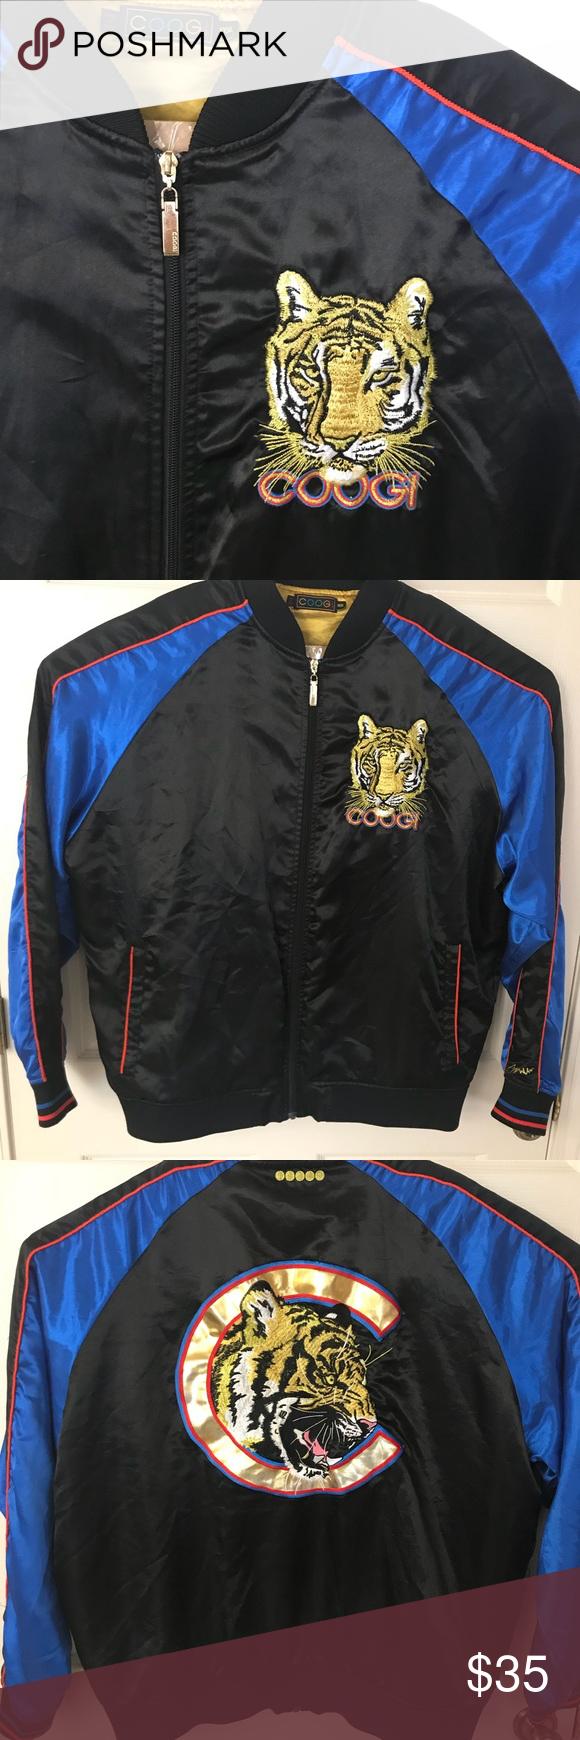 c9b8bd114 Black Coogi Lion Bomber Jacket Black bomber jacket with lion ...